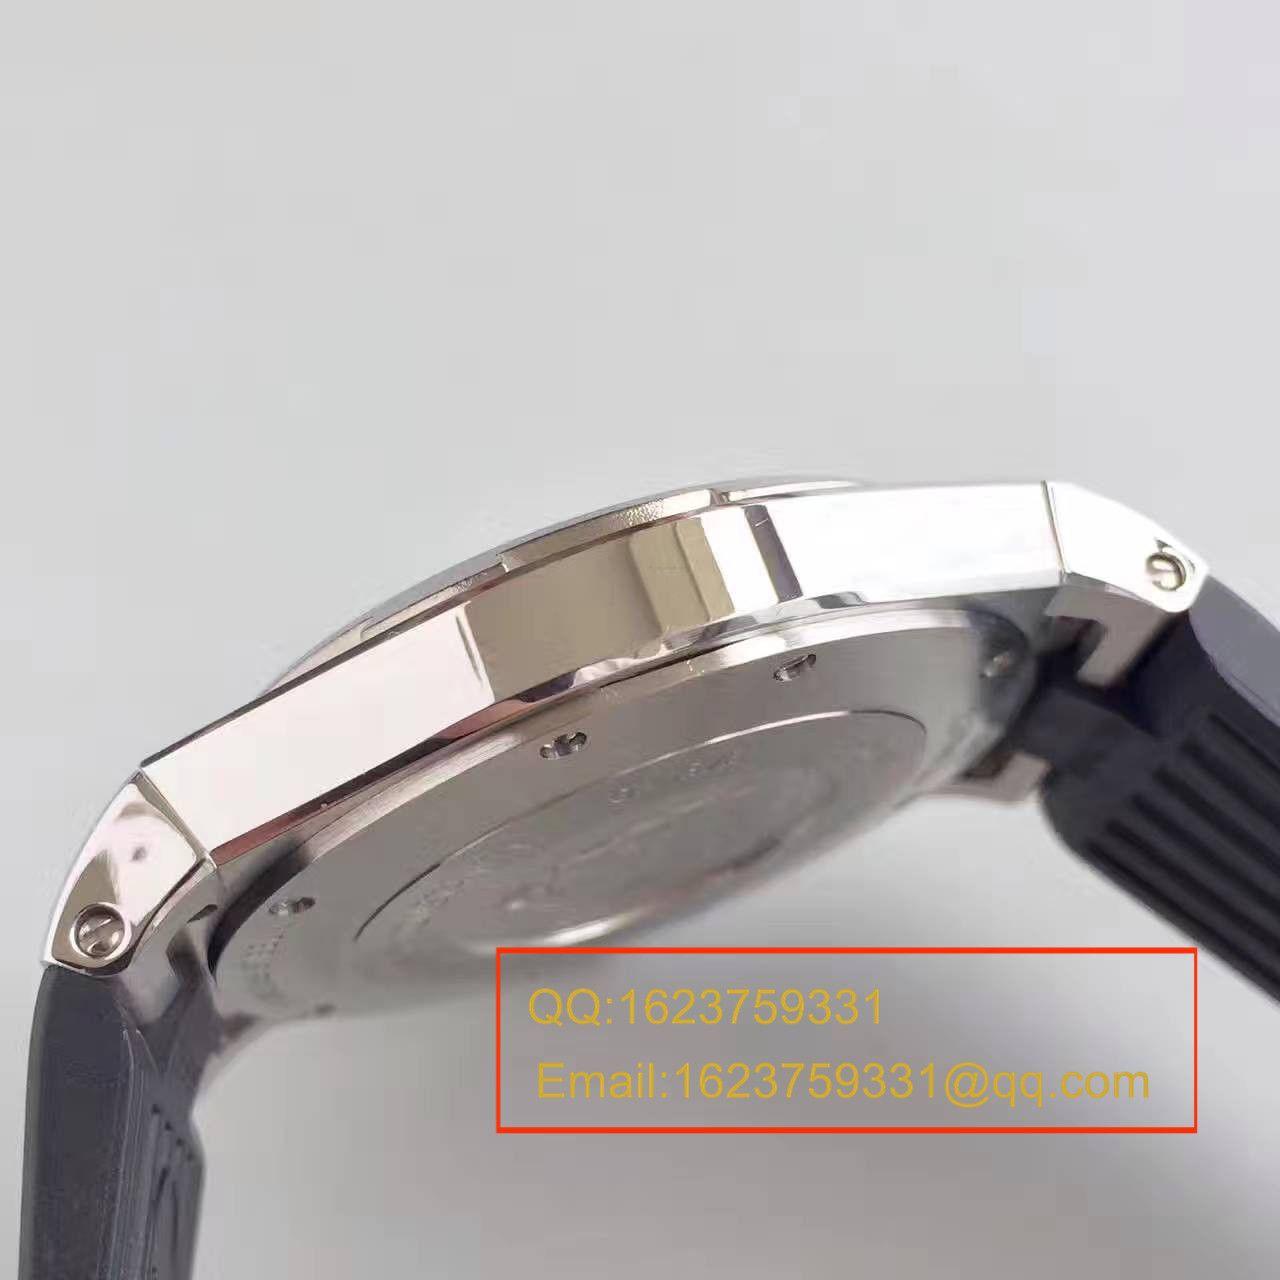 【JJ厂一比一超A高仿手表】江诗丹顿纵横四海系列47040/000W-9500腕表 / JS185